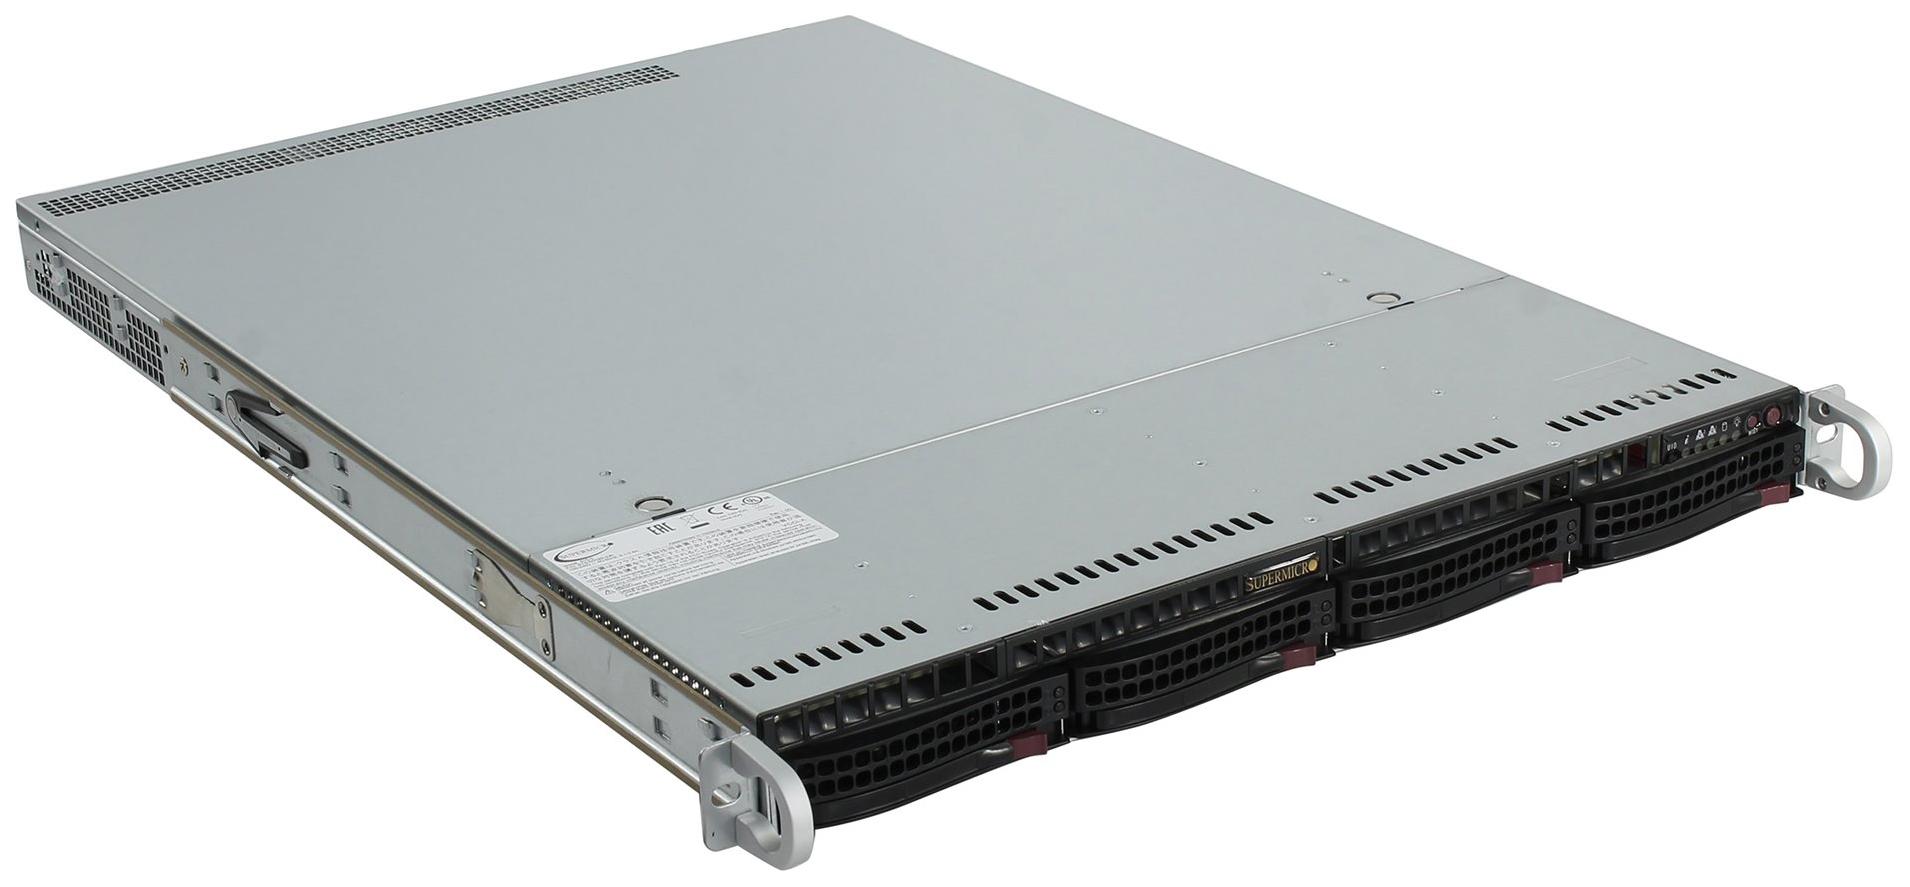 Серверная платформа Supermicro SYS 5019S WR